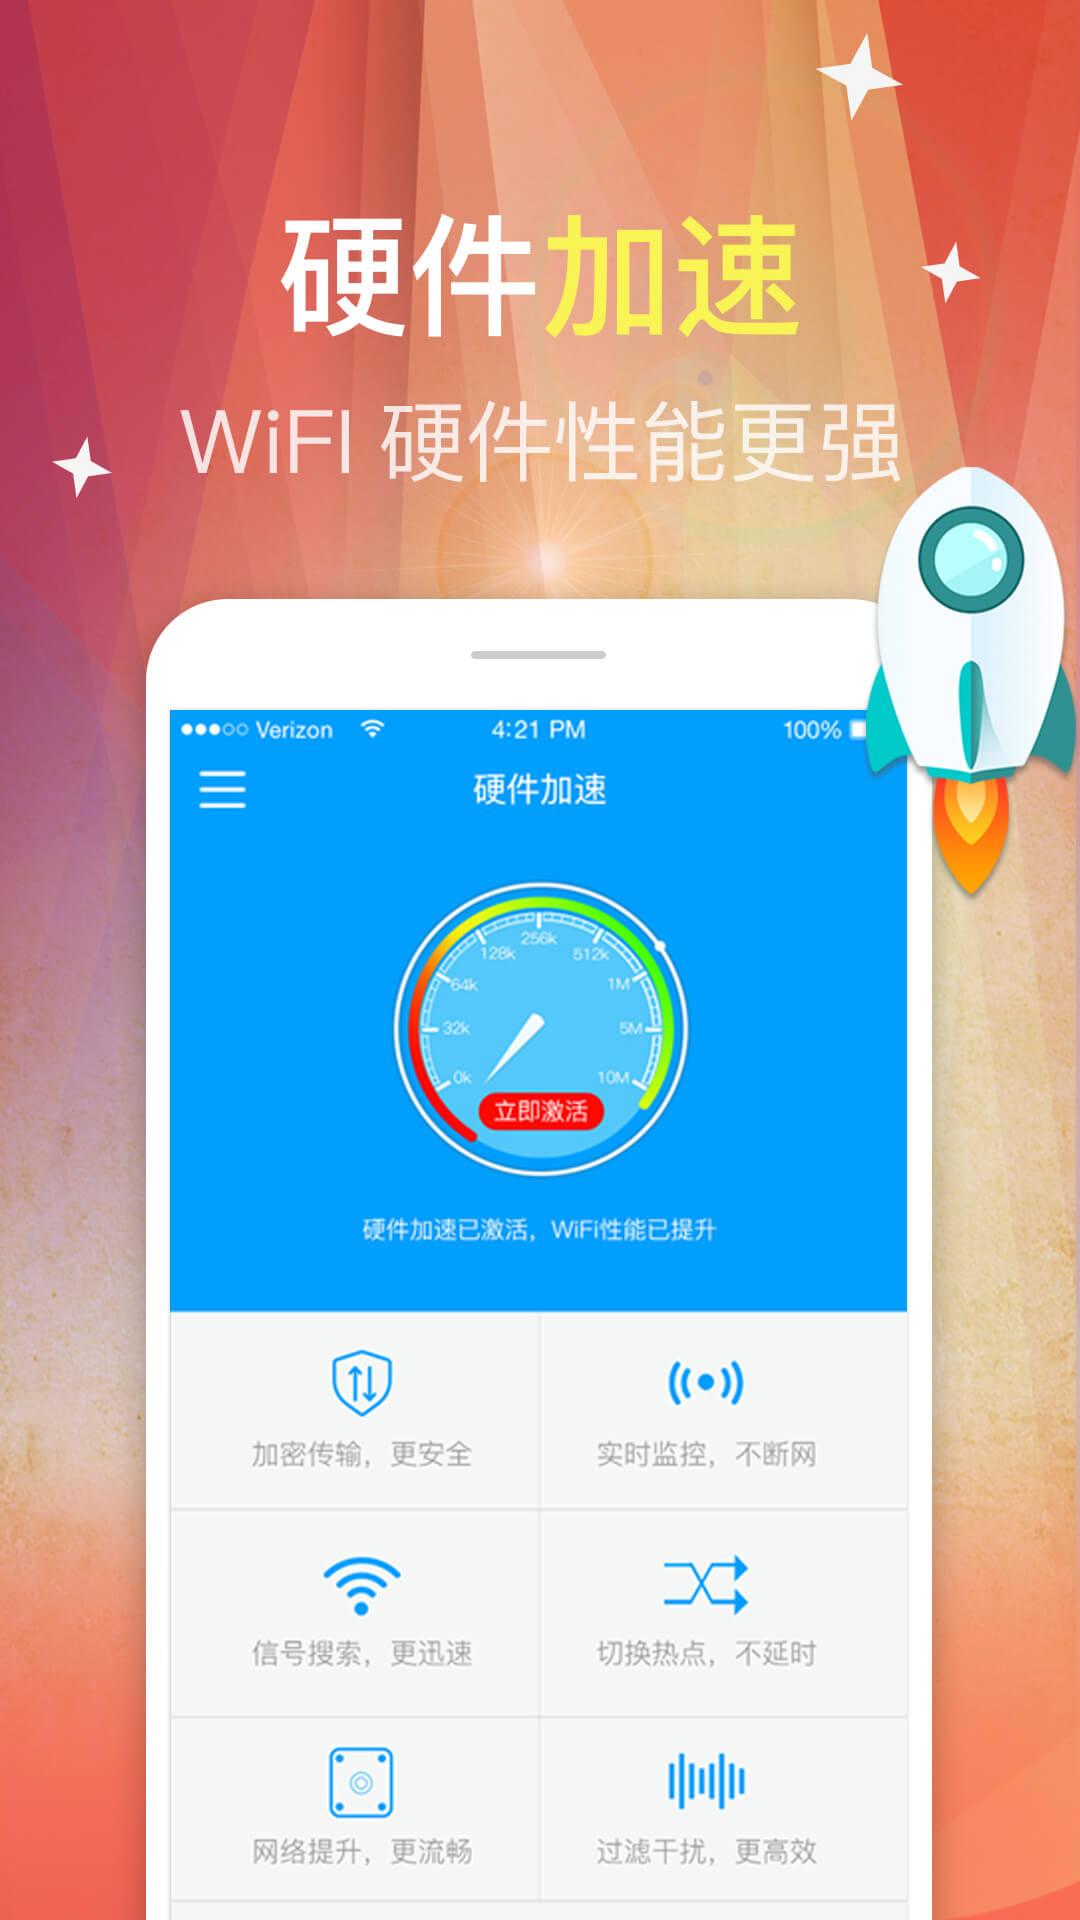 WiFi上网加速器-应用截图